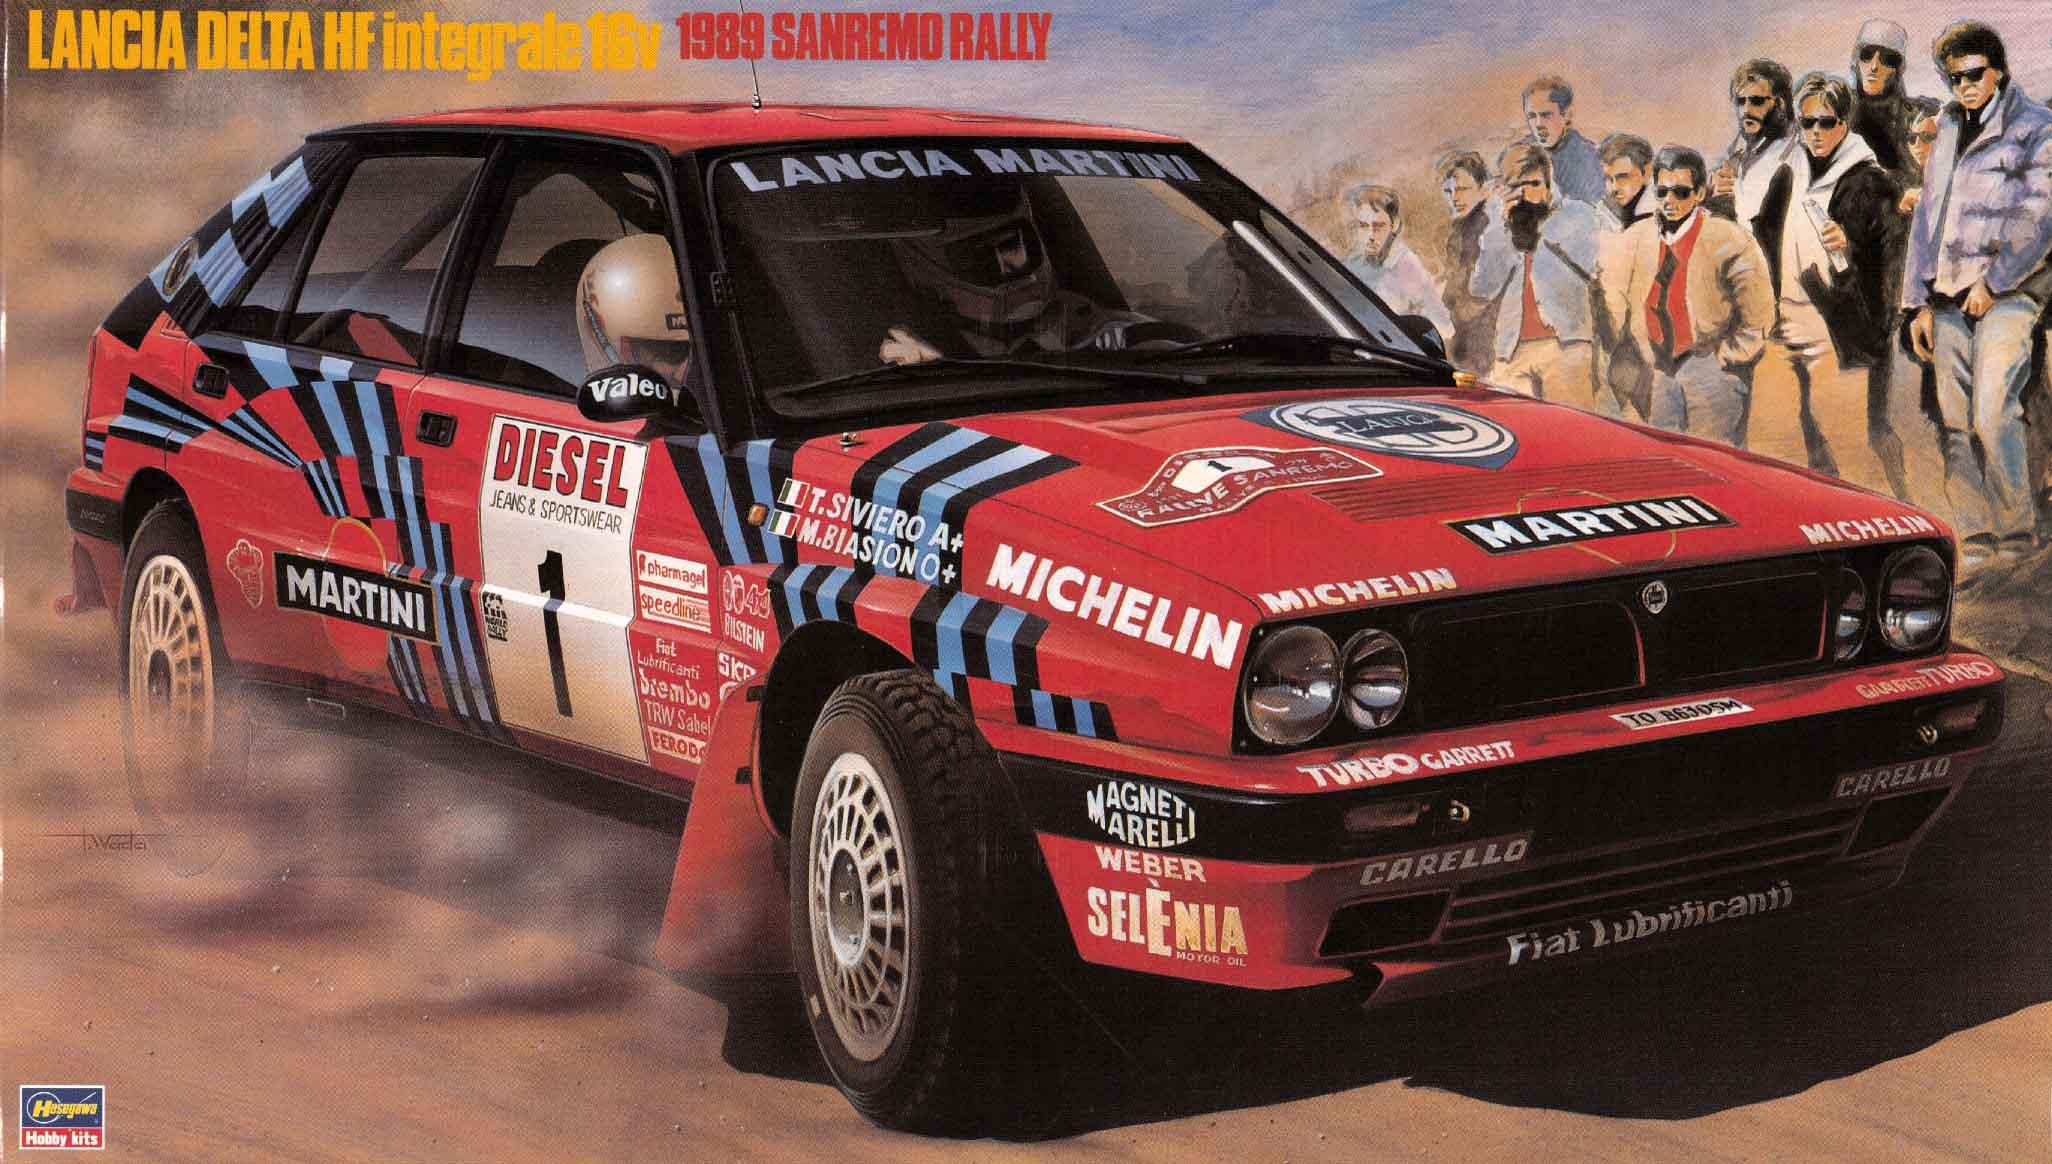 Hasegawa 1/24 Lancia Delta Hf Integrale 16V (1989 Sanremo Rally)